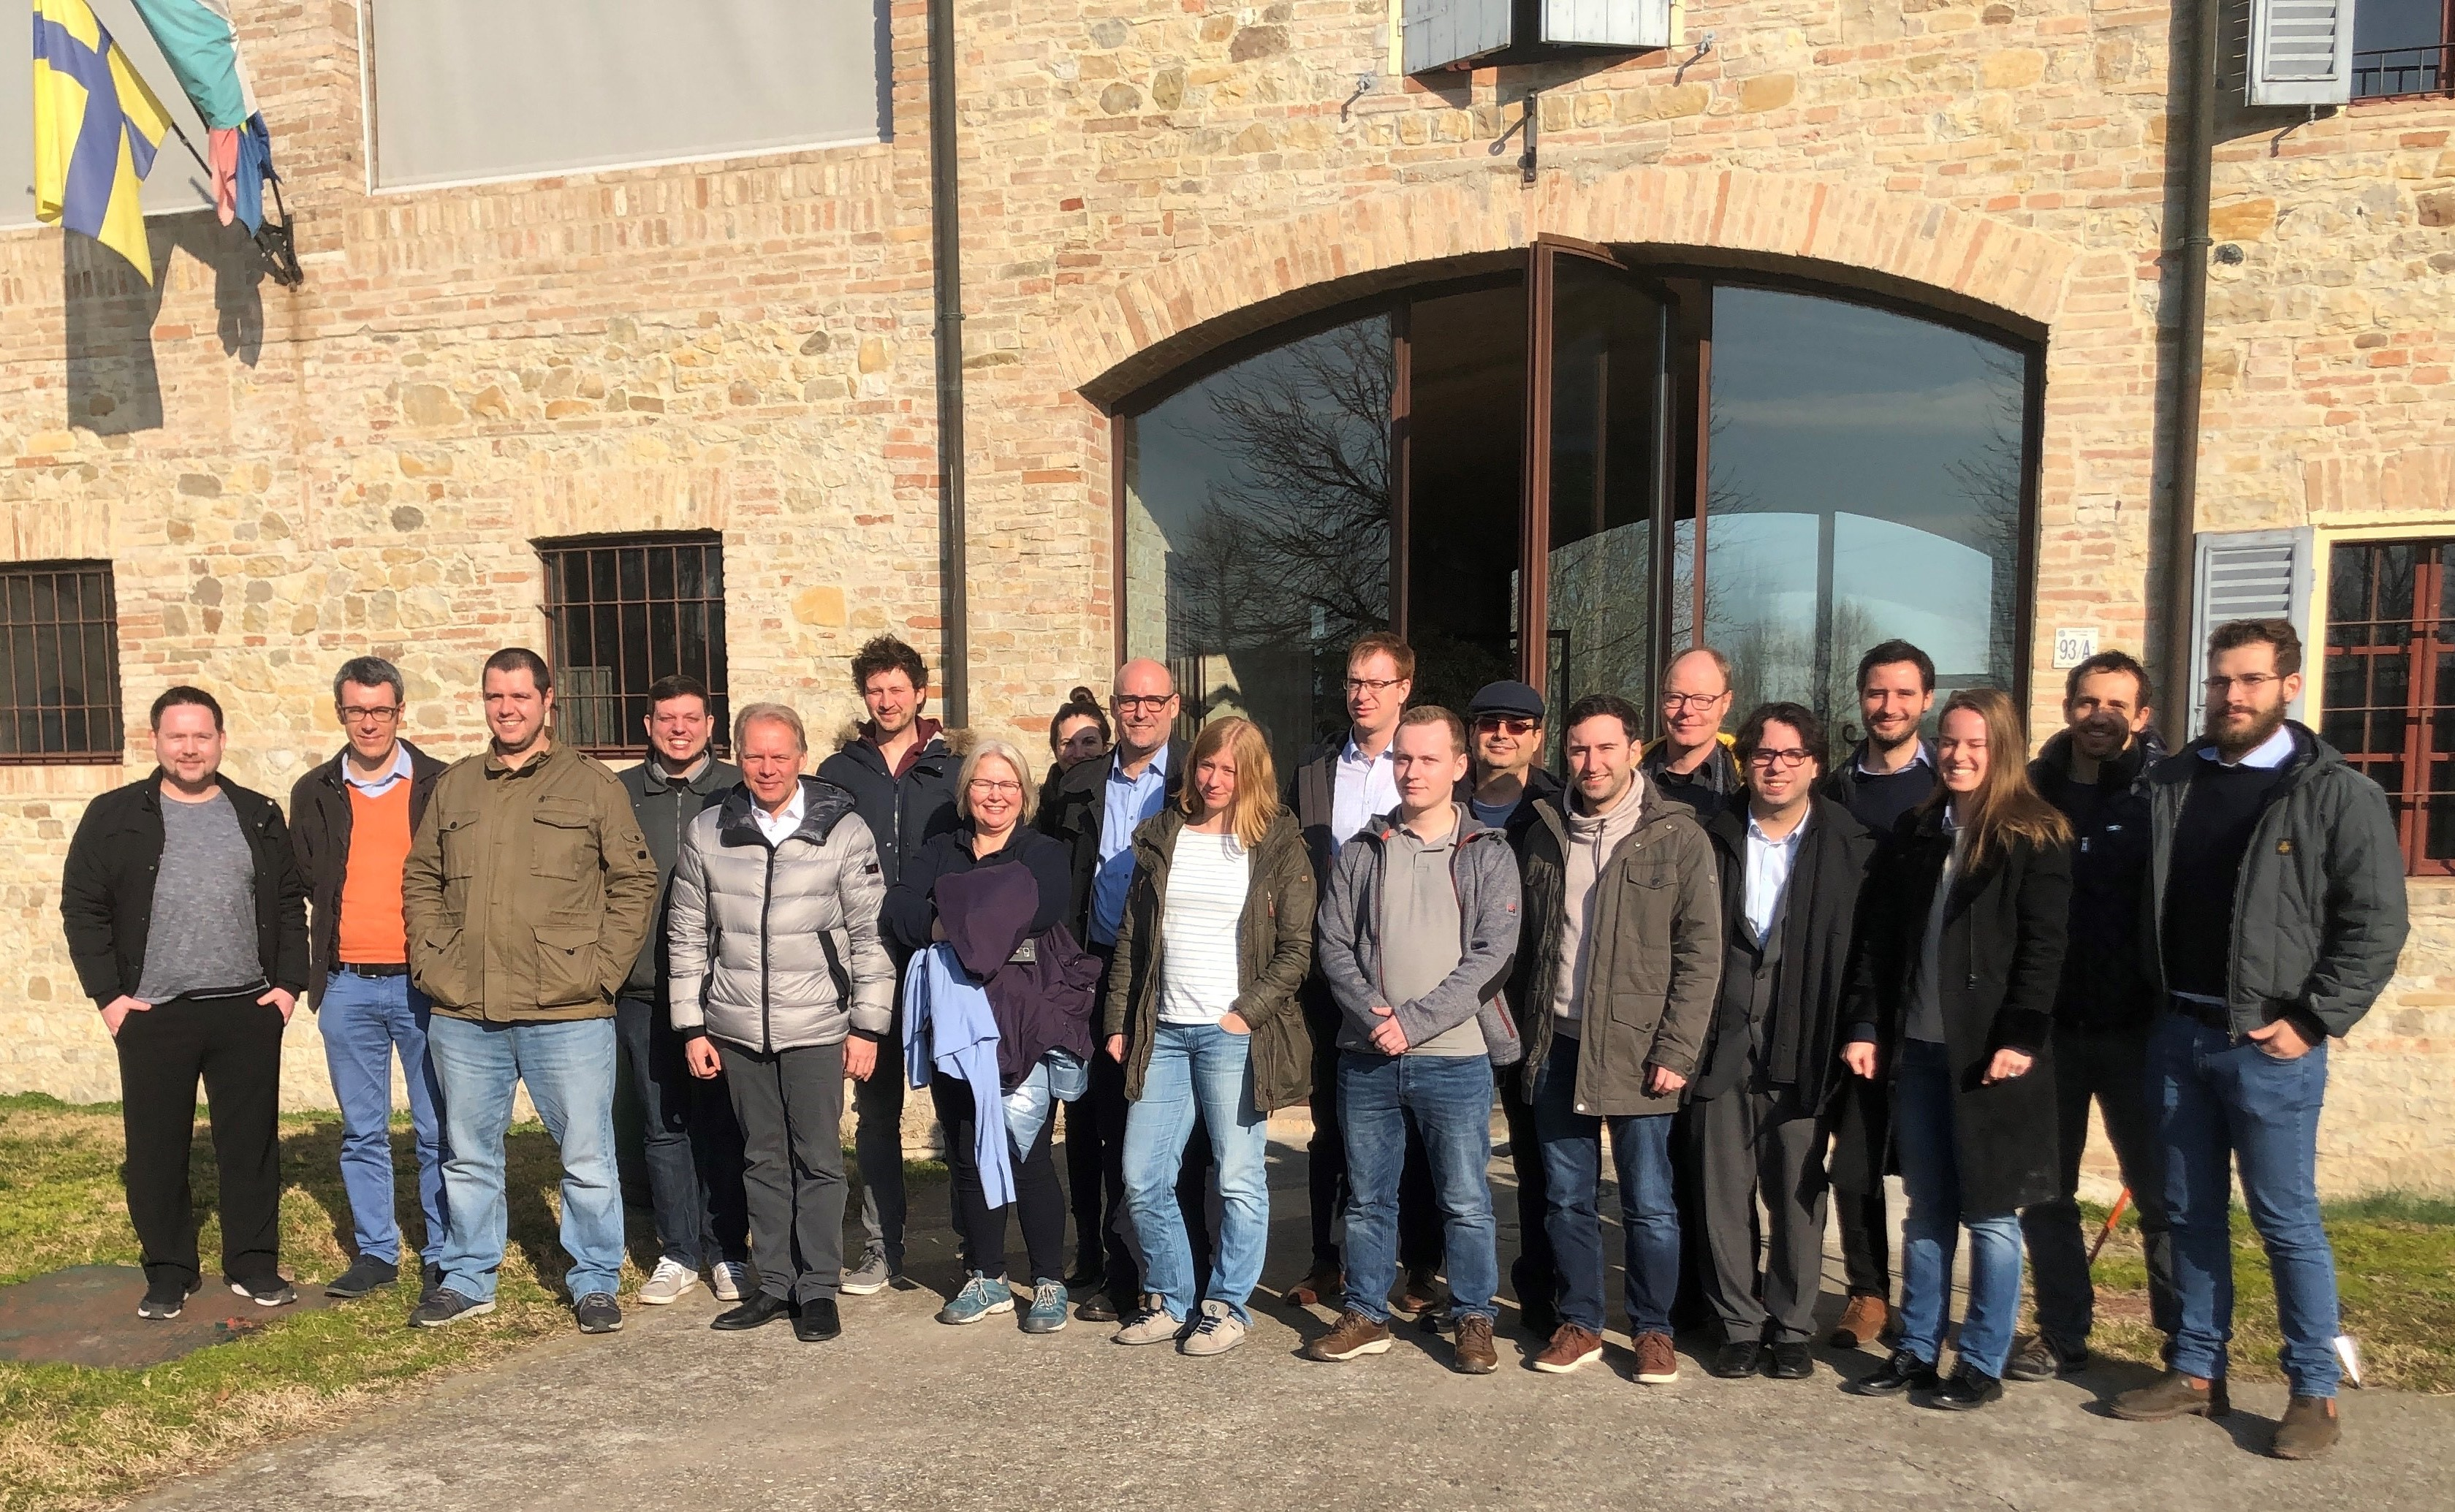 3rd Consortial Meeting DigiLab4U, Parma 23-24.01.2020